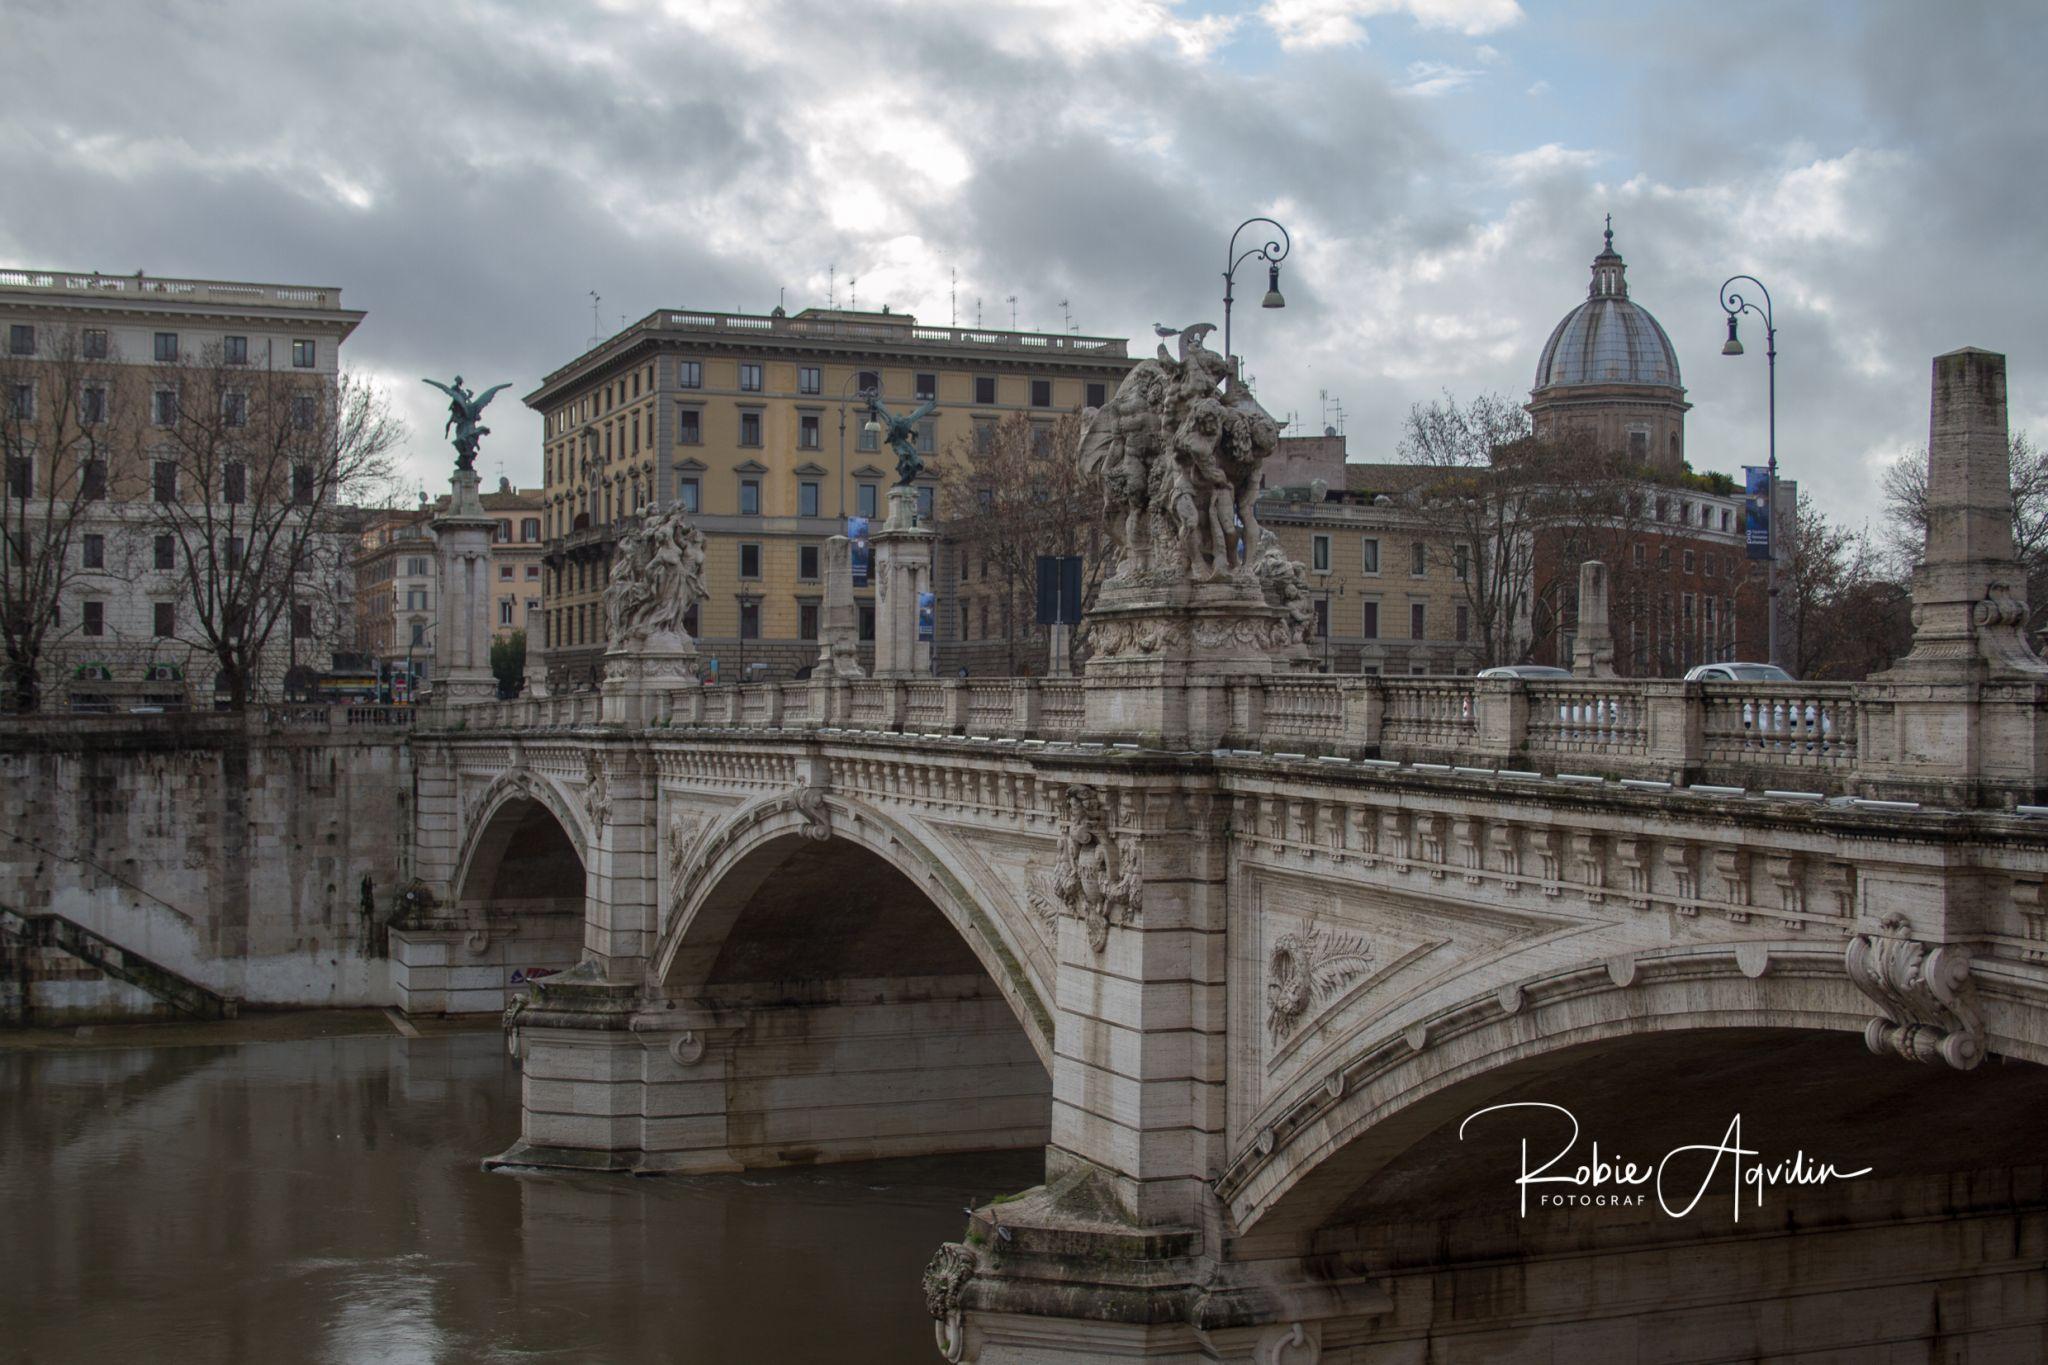 Tiber river, Italy